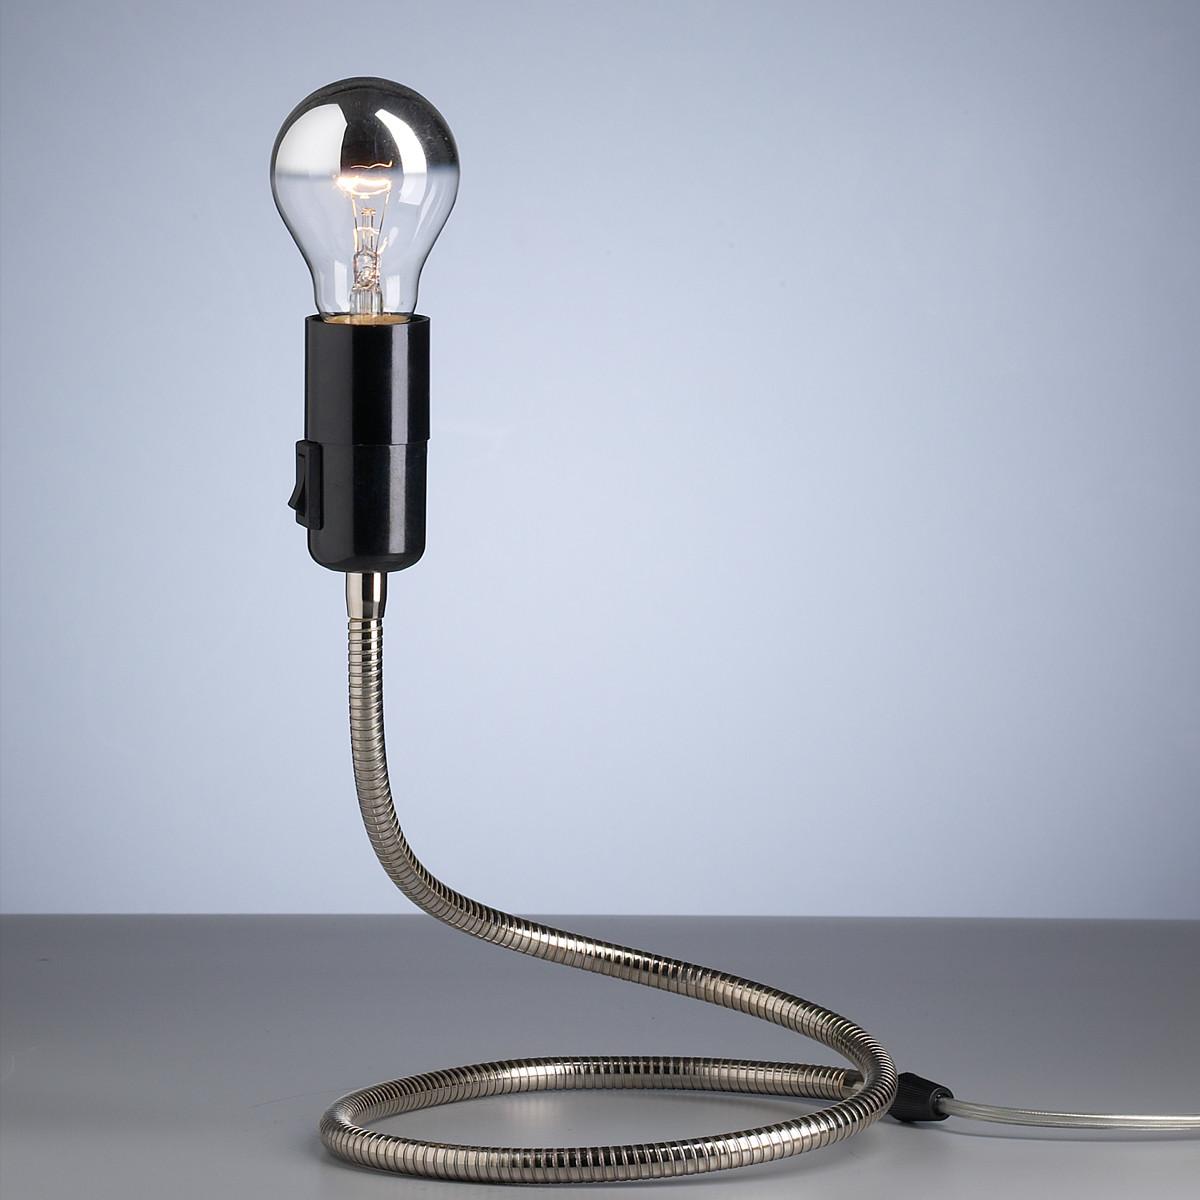 tecnolumen lightworm tischleuchte casa de. Black Bedroom Furniture Sets. Home Design Ideas